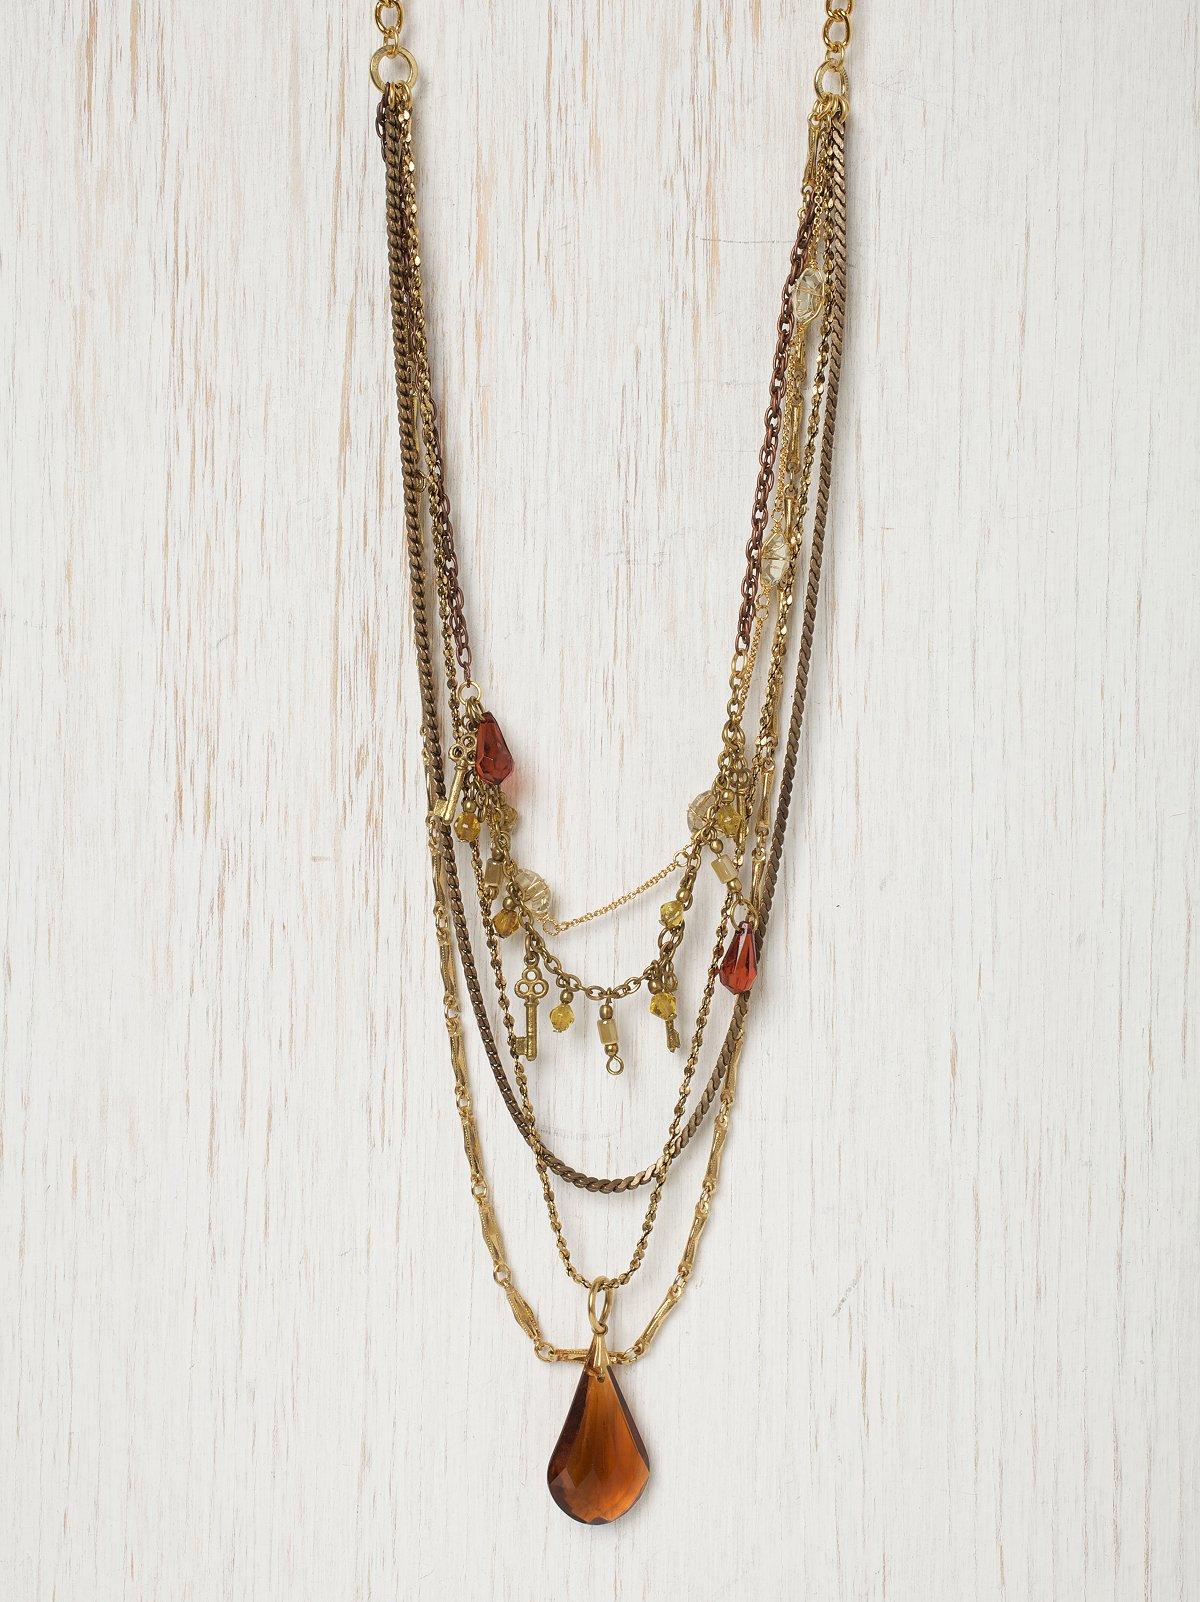 3 Keys Of Amber Necklace